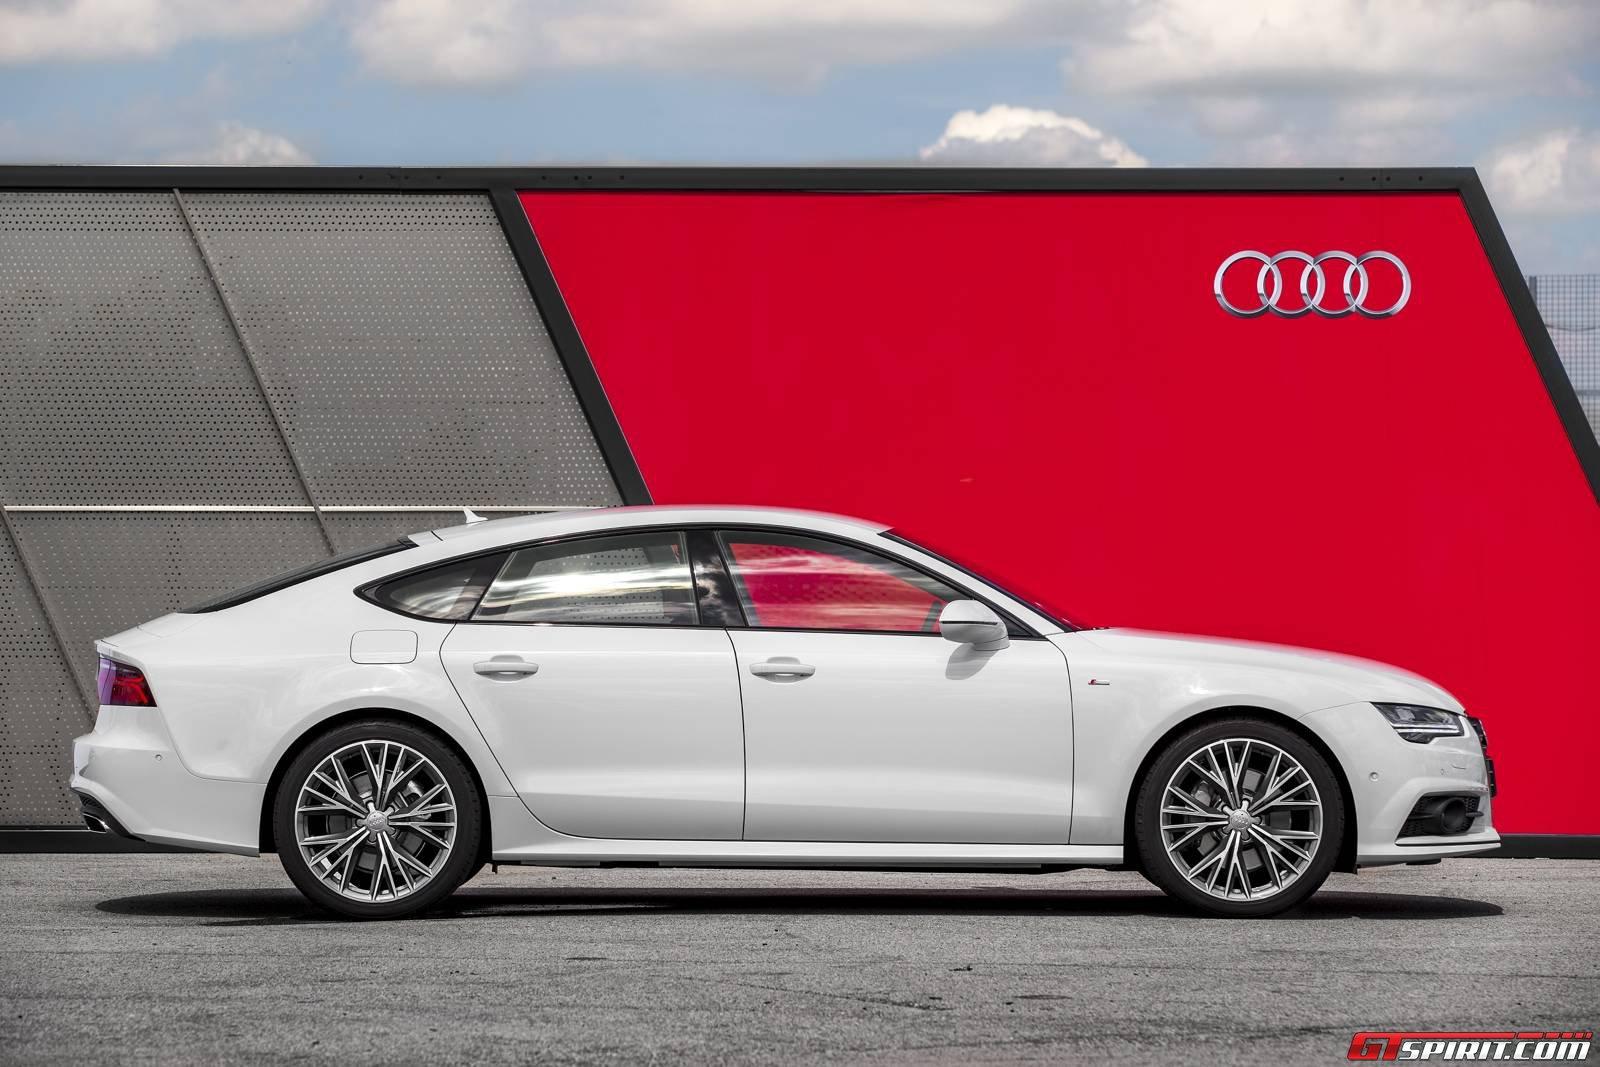 2015 Audi A7 Sportback Facelift Review - GTspirit